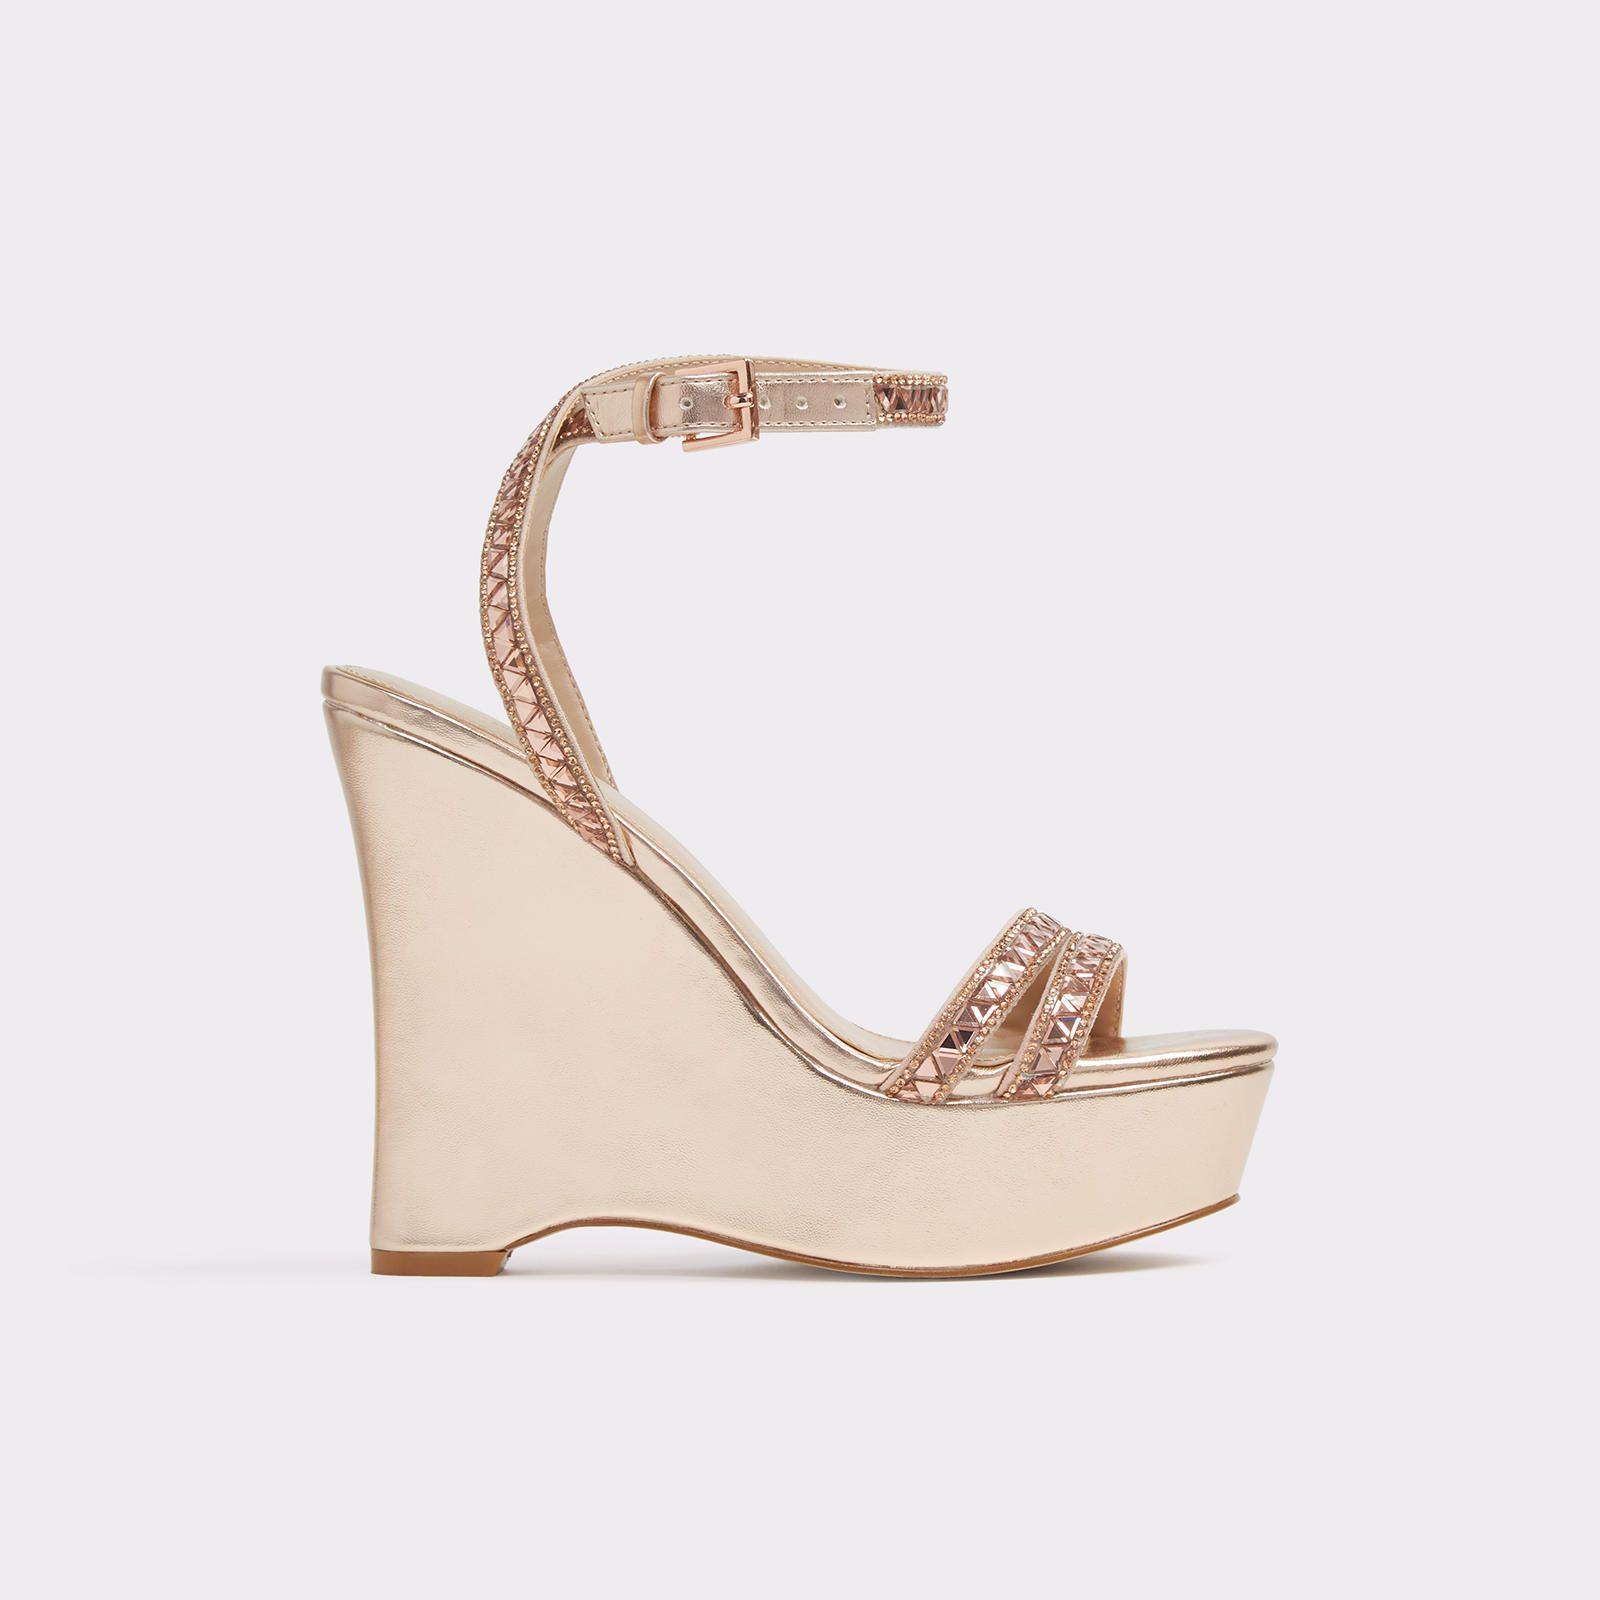 63223d68bc8 Loenia metallic misc. by Aldo Shoes - Main Women s Heels